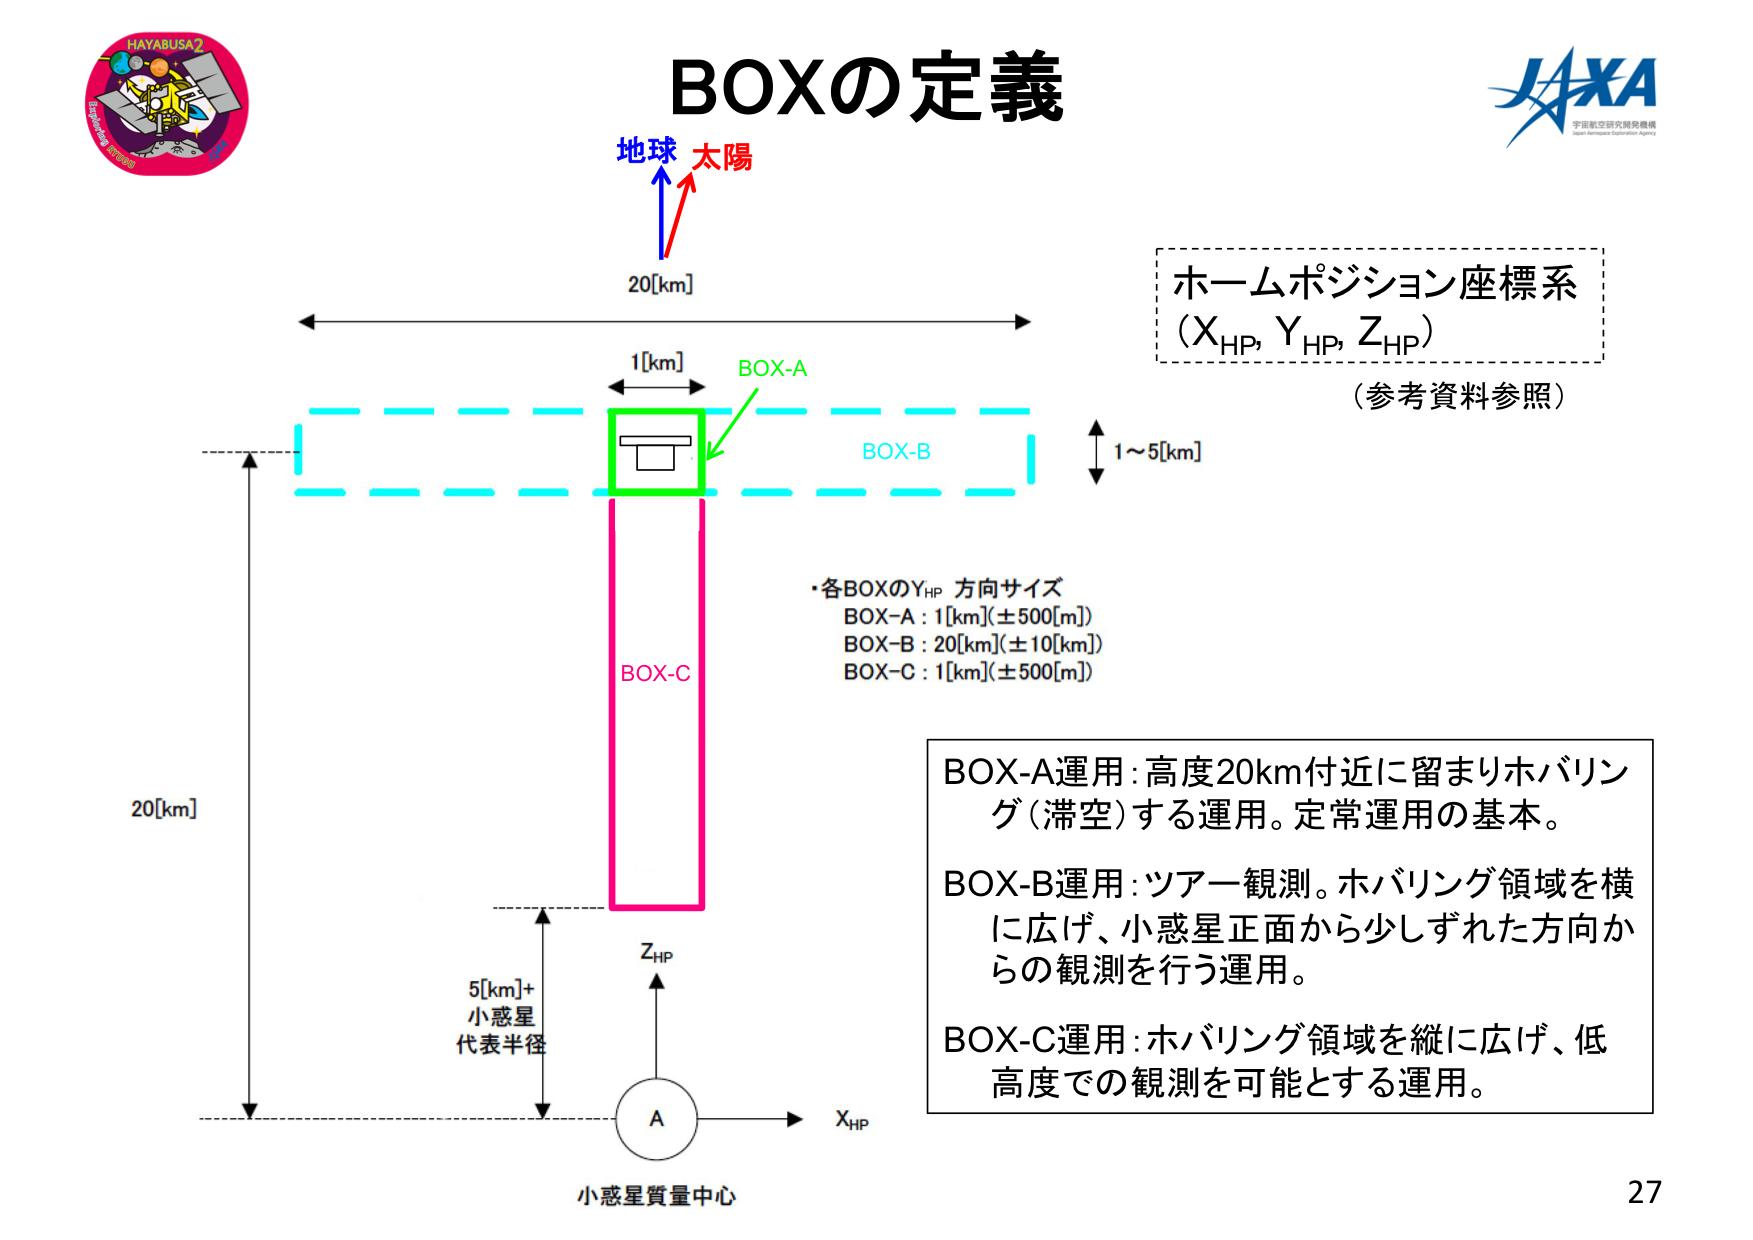 f:id:Imamura:20180905231959p:plain